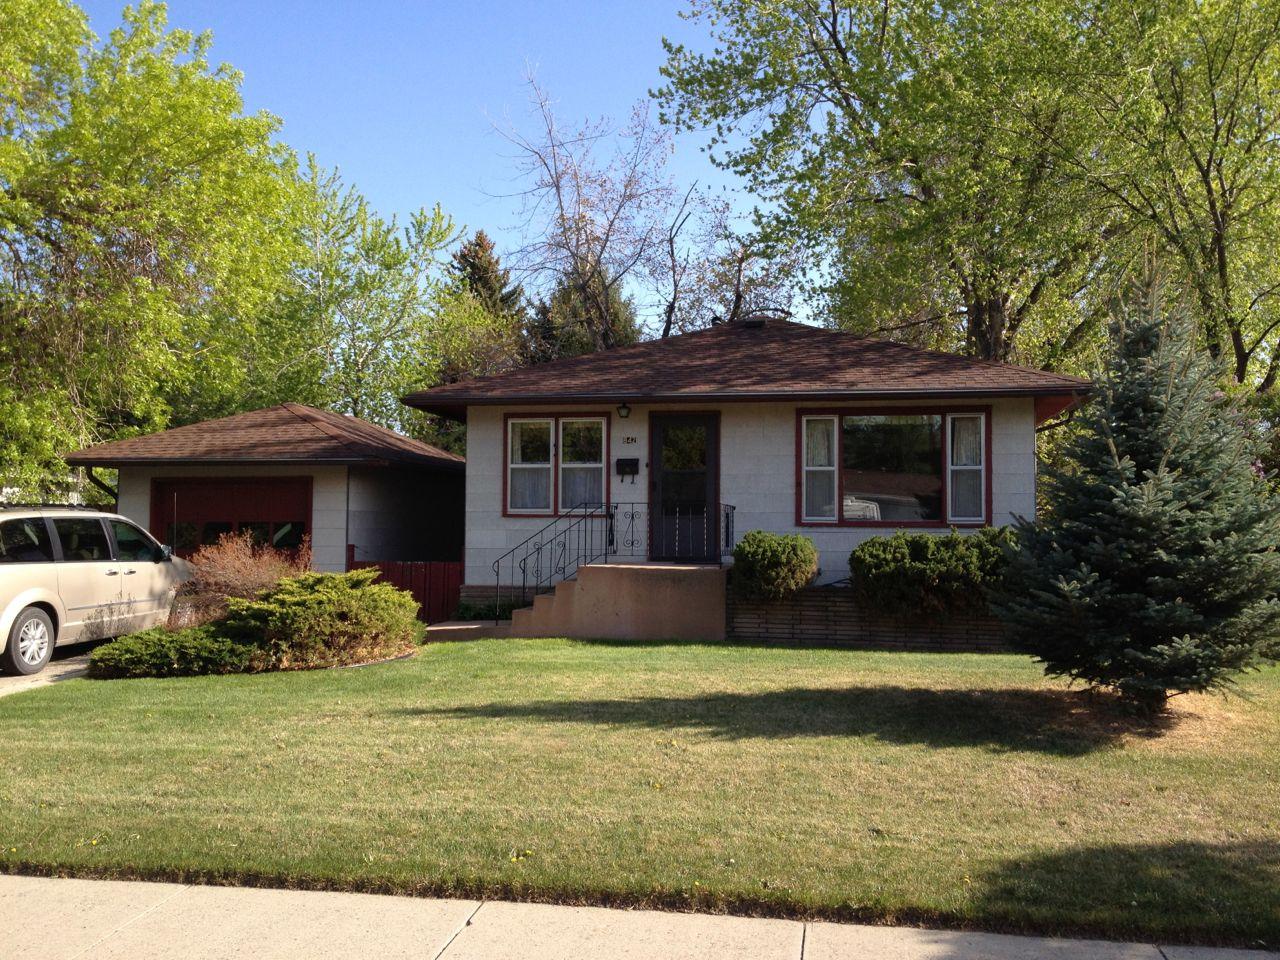 Standard American Houses